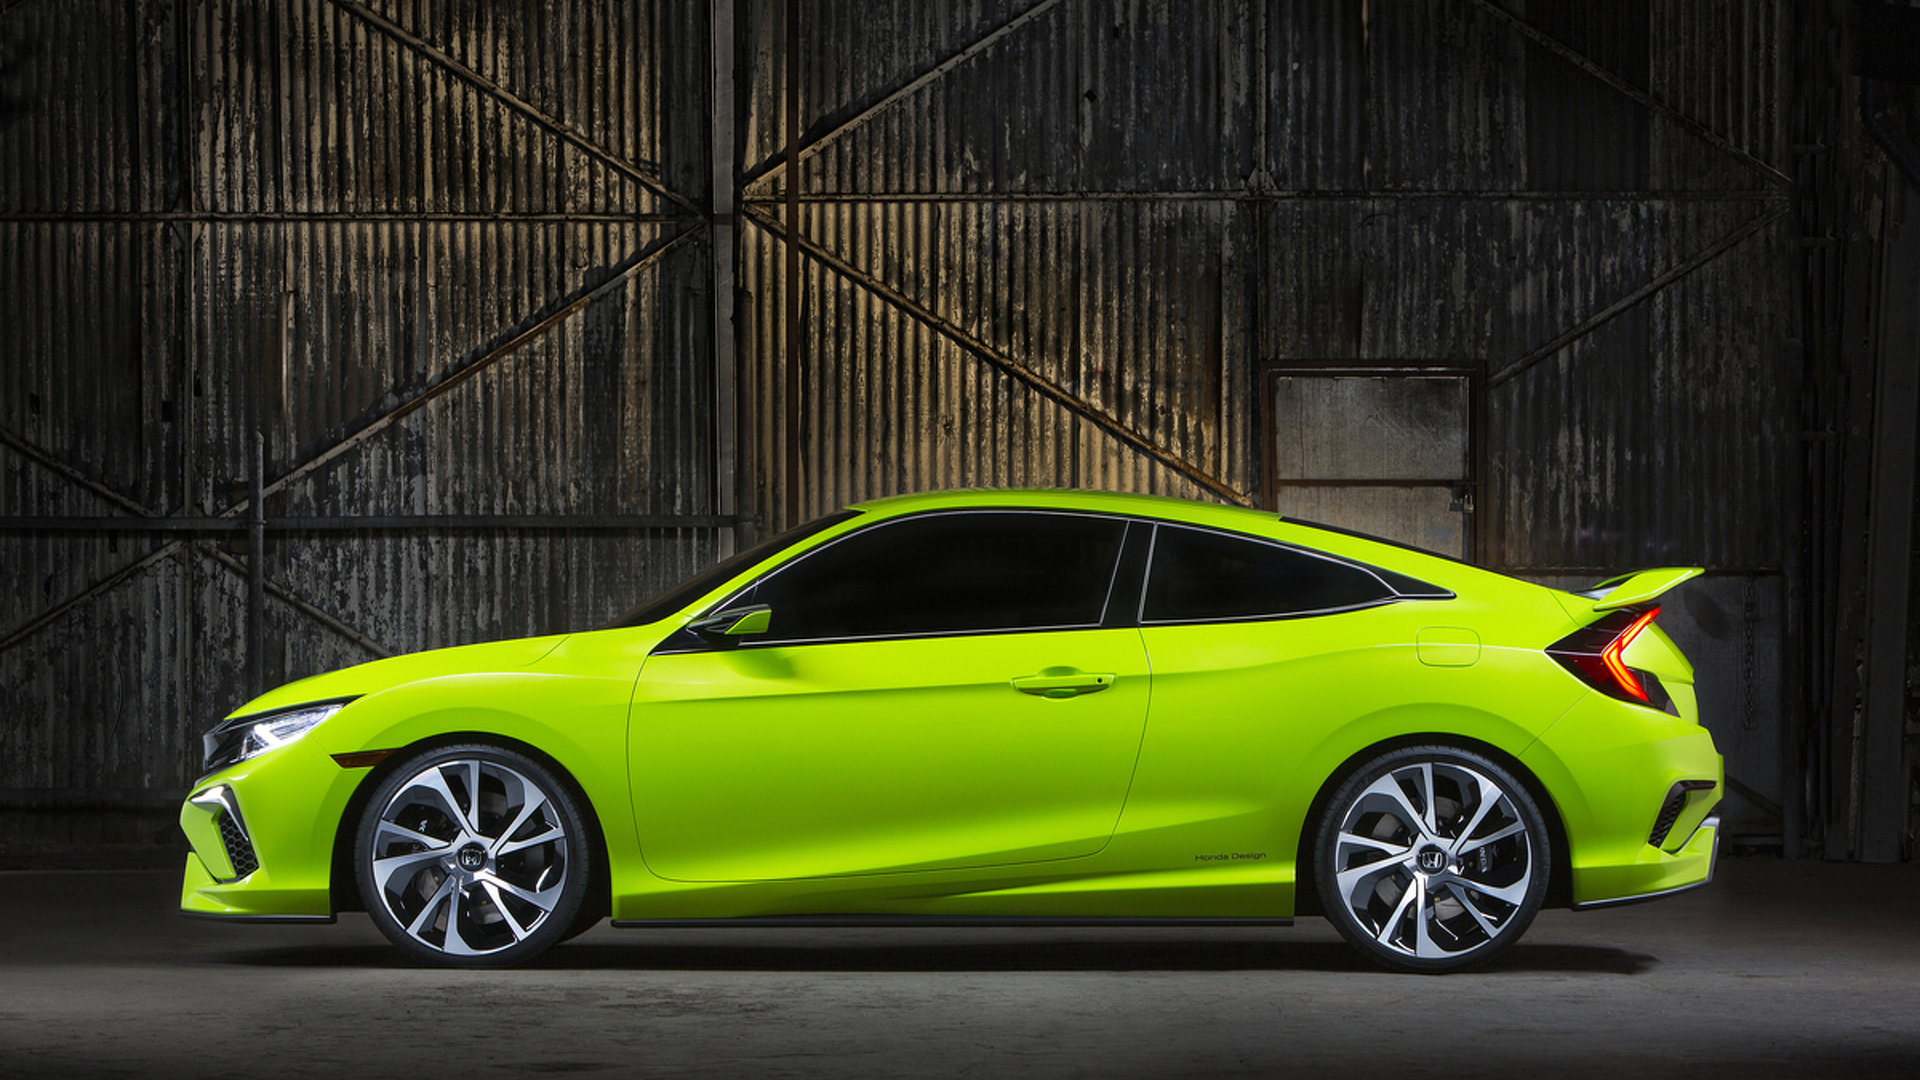 Honda Civic 10Th Gen >> Tenth Gen Honda Civic Coupe Designer Talks Behind The Design